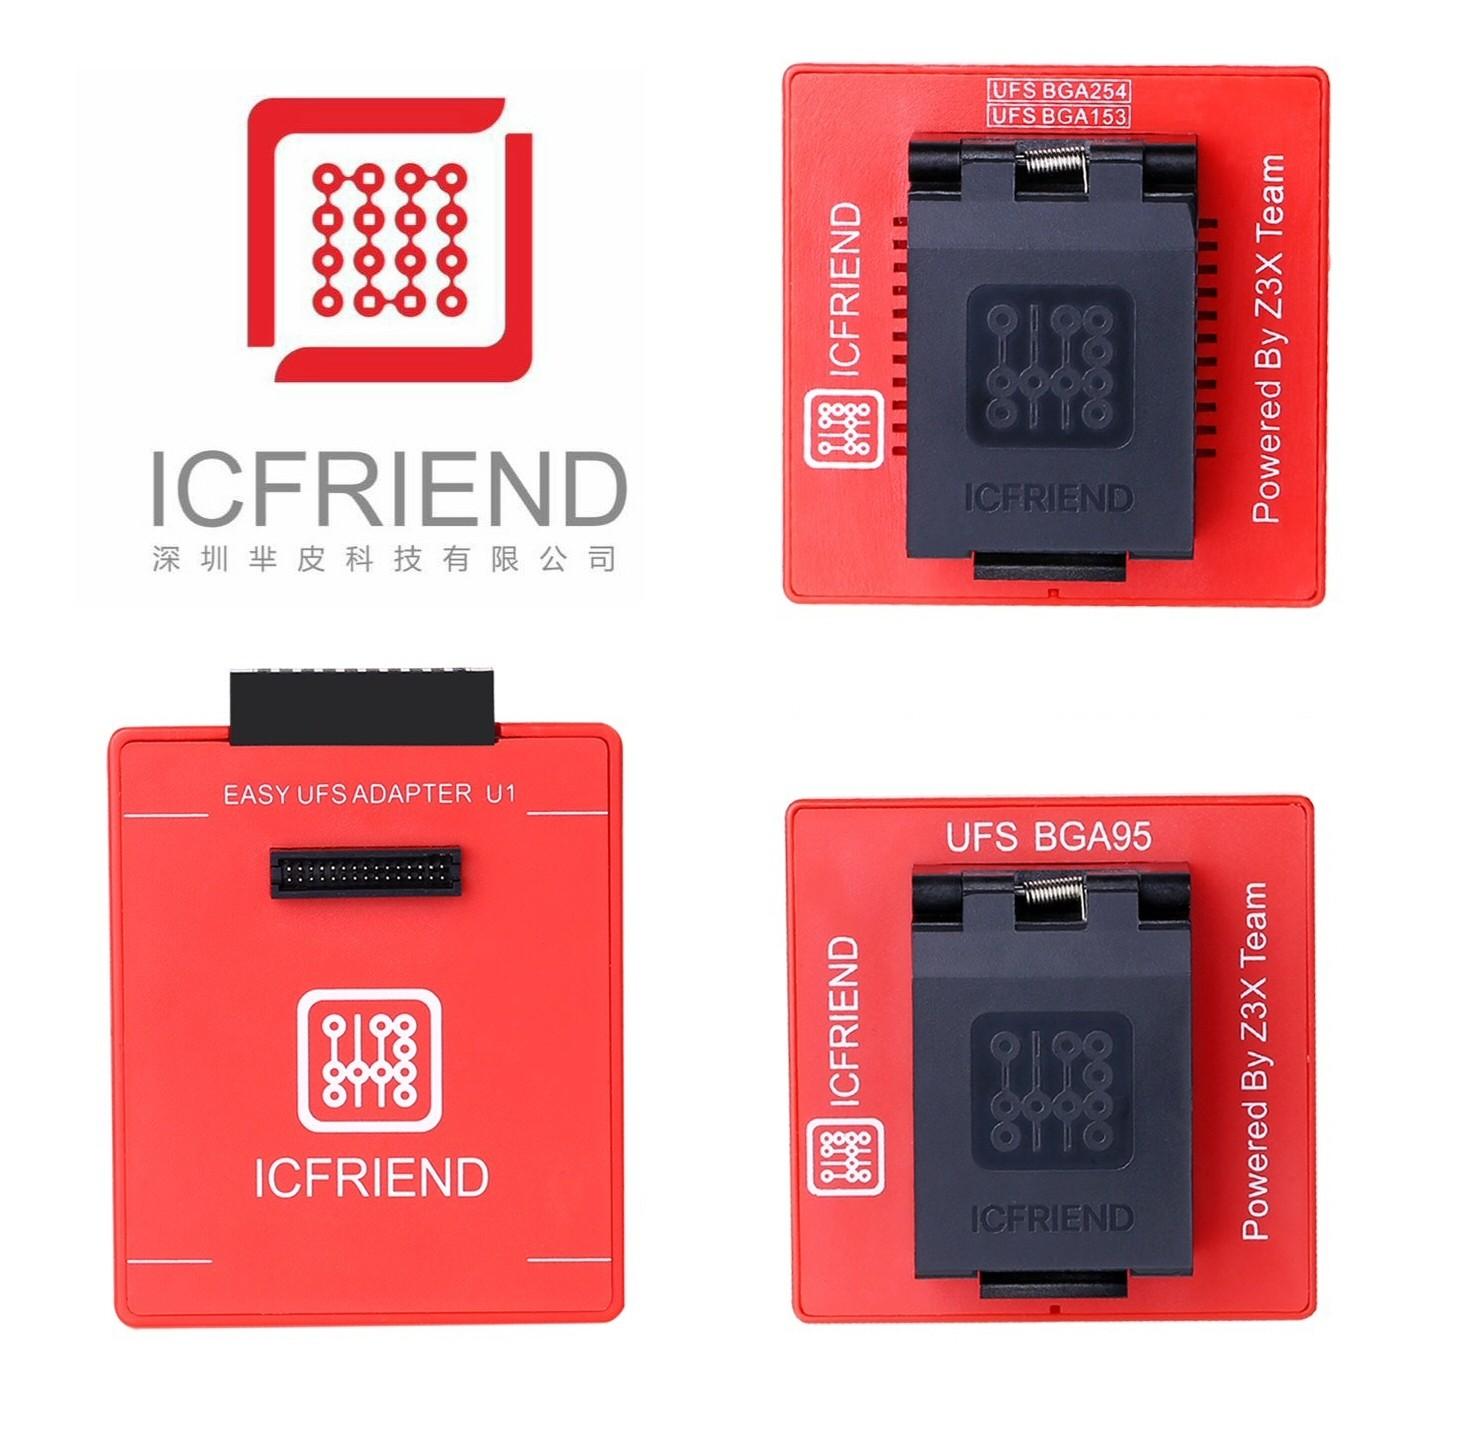 ICFriend 3-in-1 UFS Chip Reader For Z3X Easy JTAG Plus Box